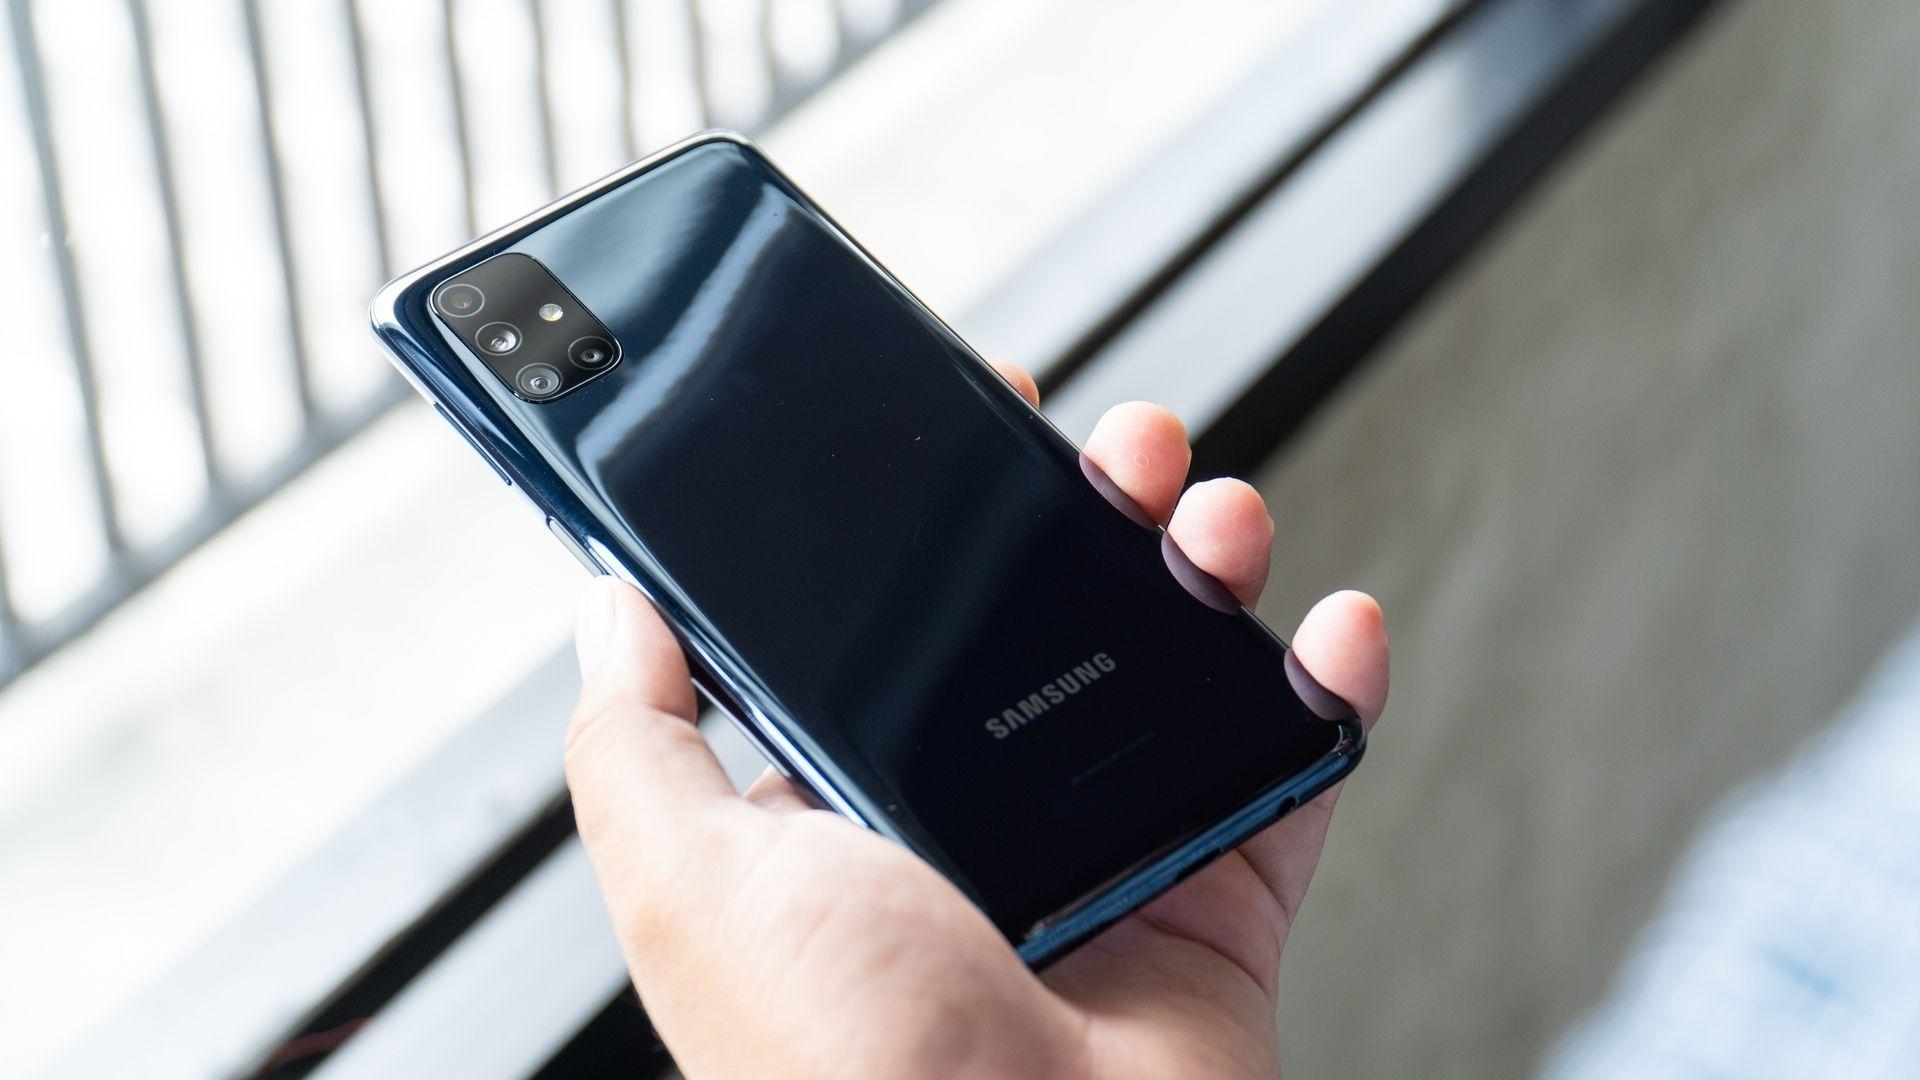 Samsung Galaxy M51 (Crédito: Shutterstock)